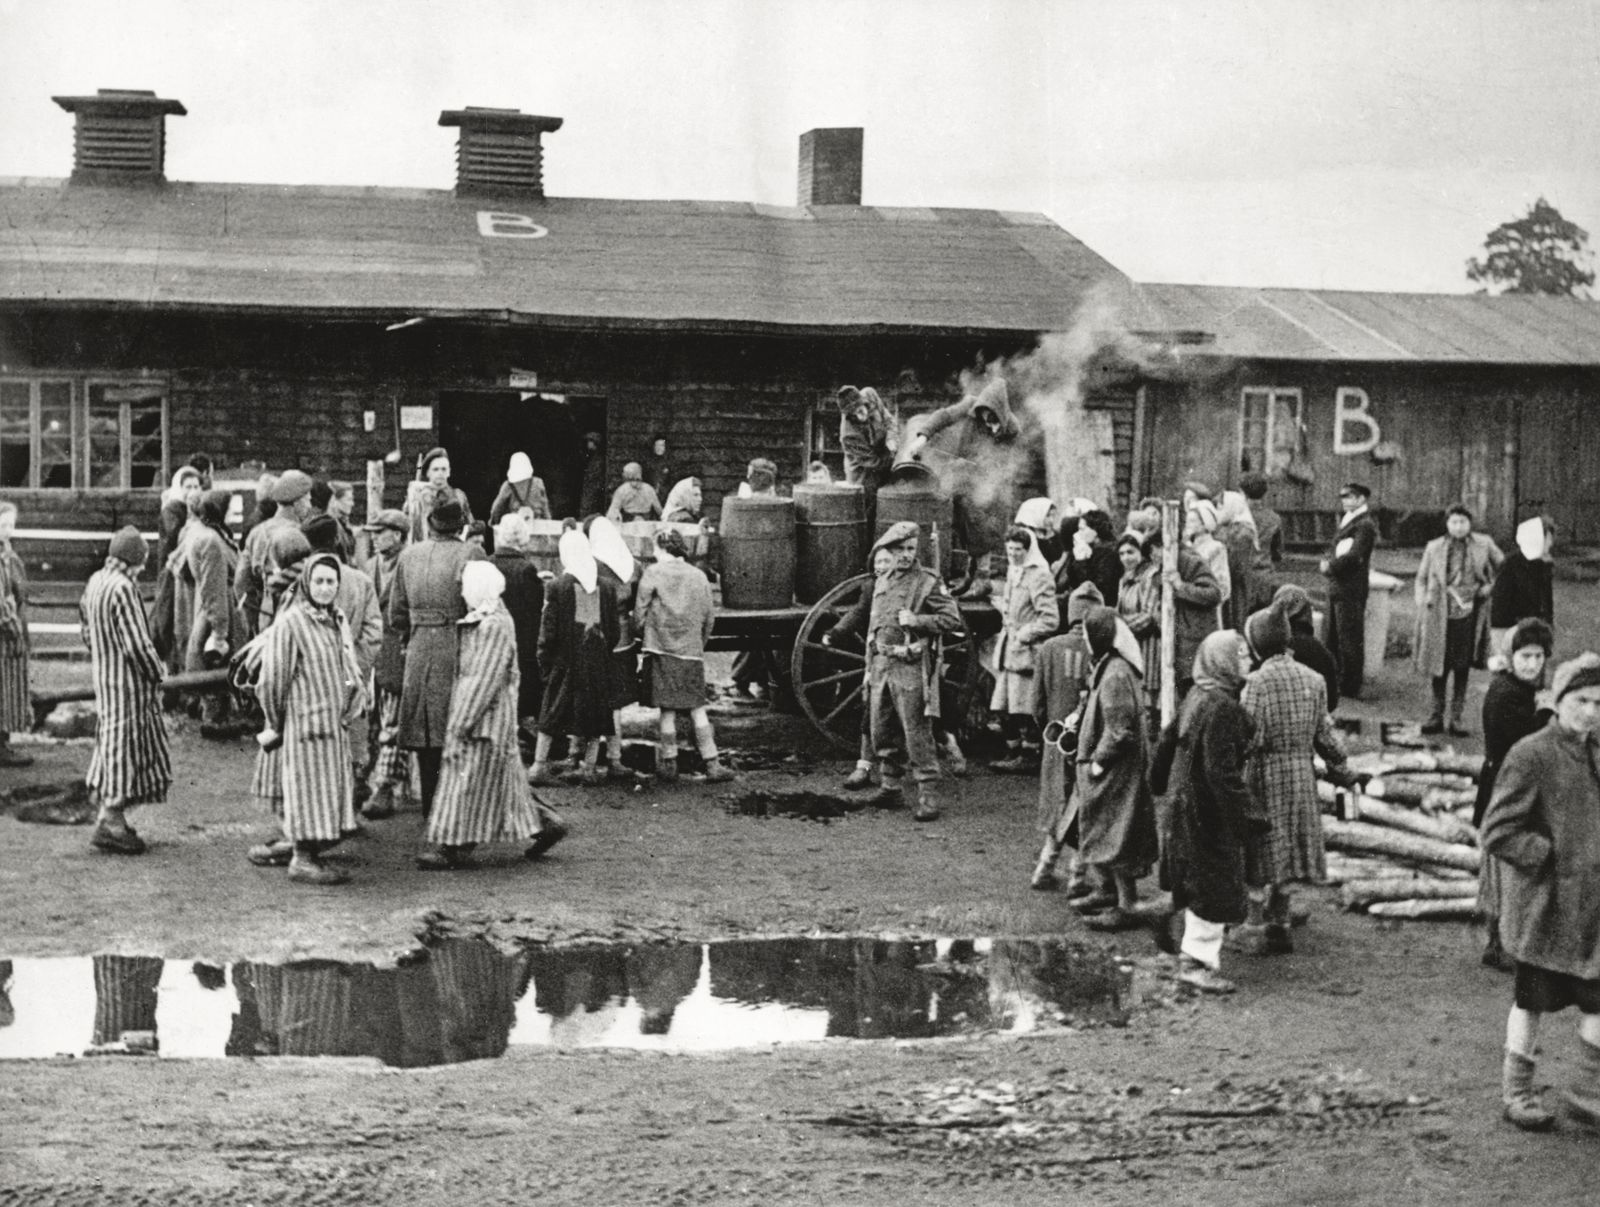 Extermination Camps